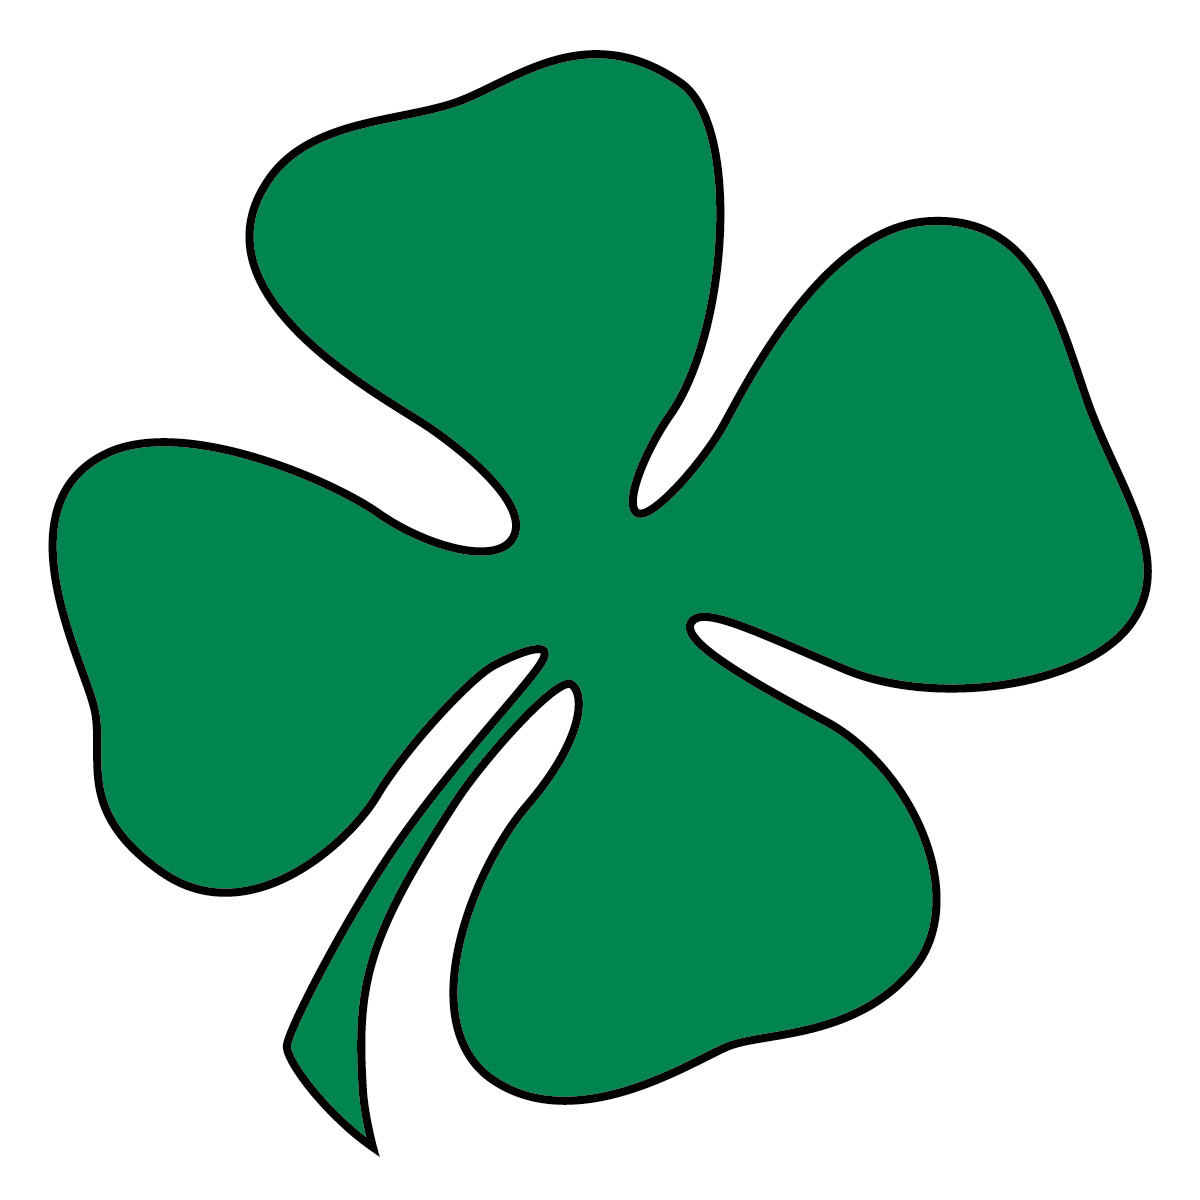 1200x1200 Clip art green four leaf clover shamrock st patrick